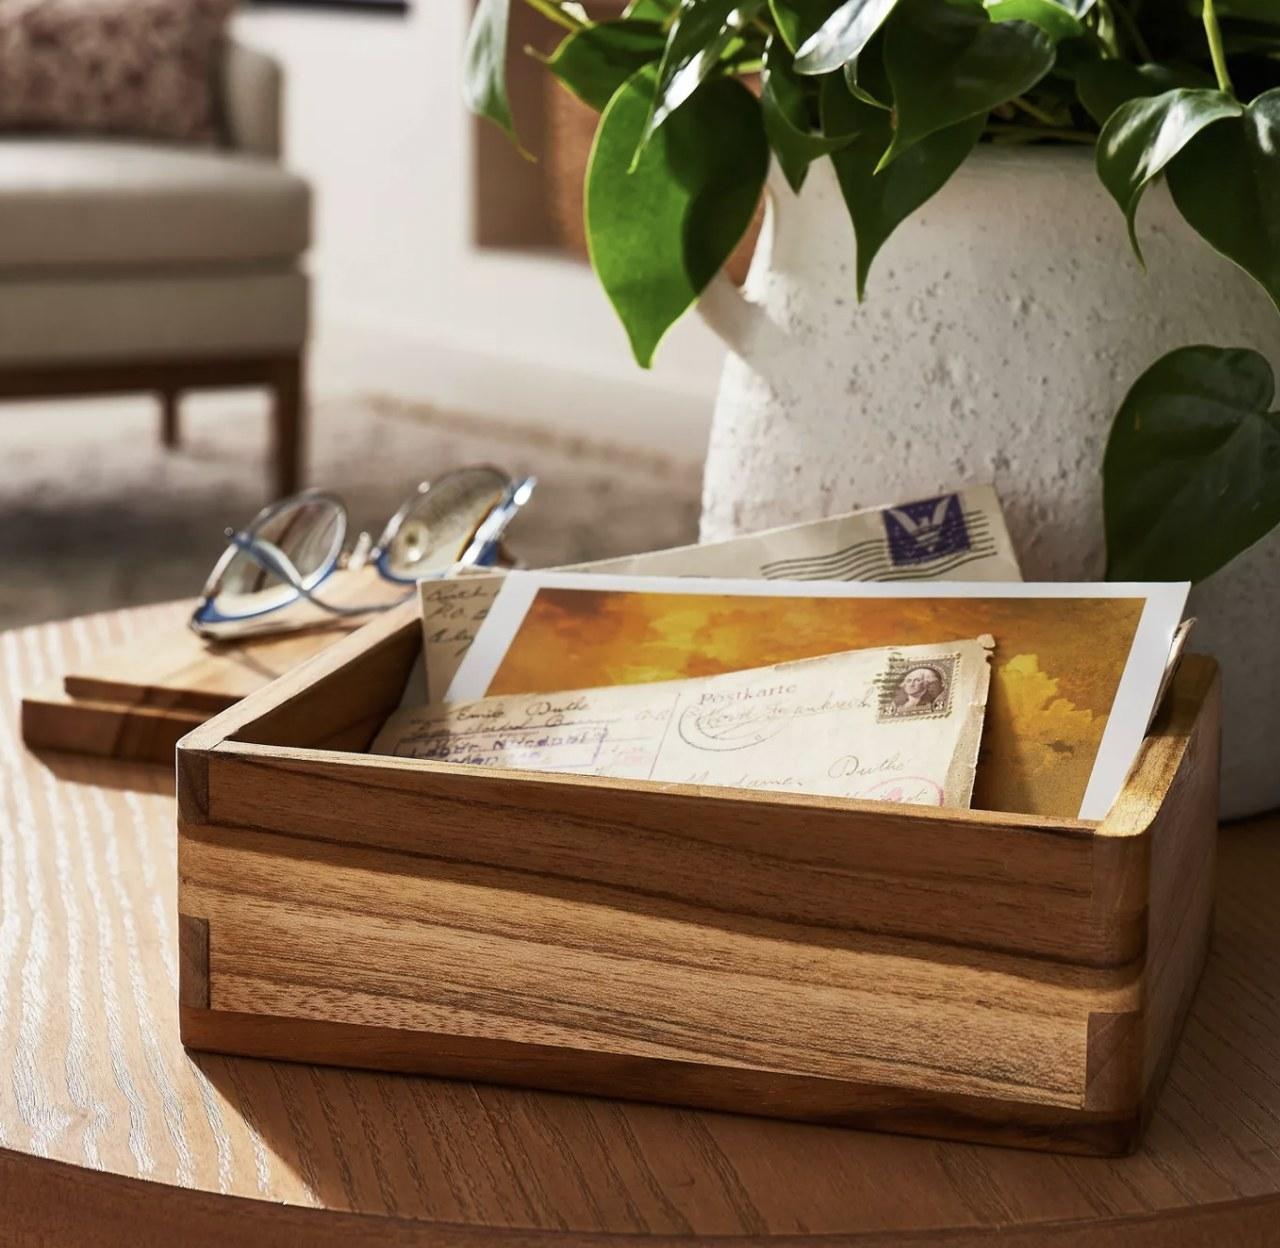 a teak wood box holding envelopes